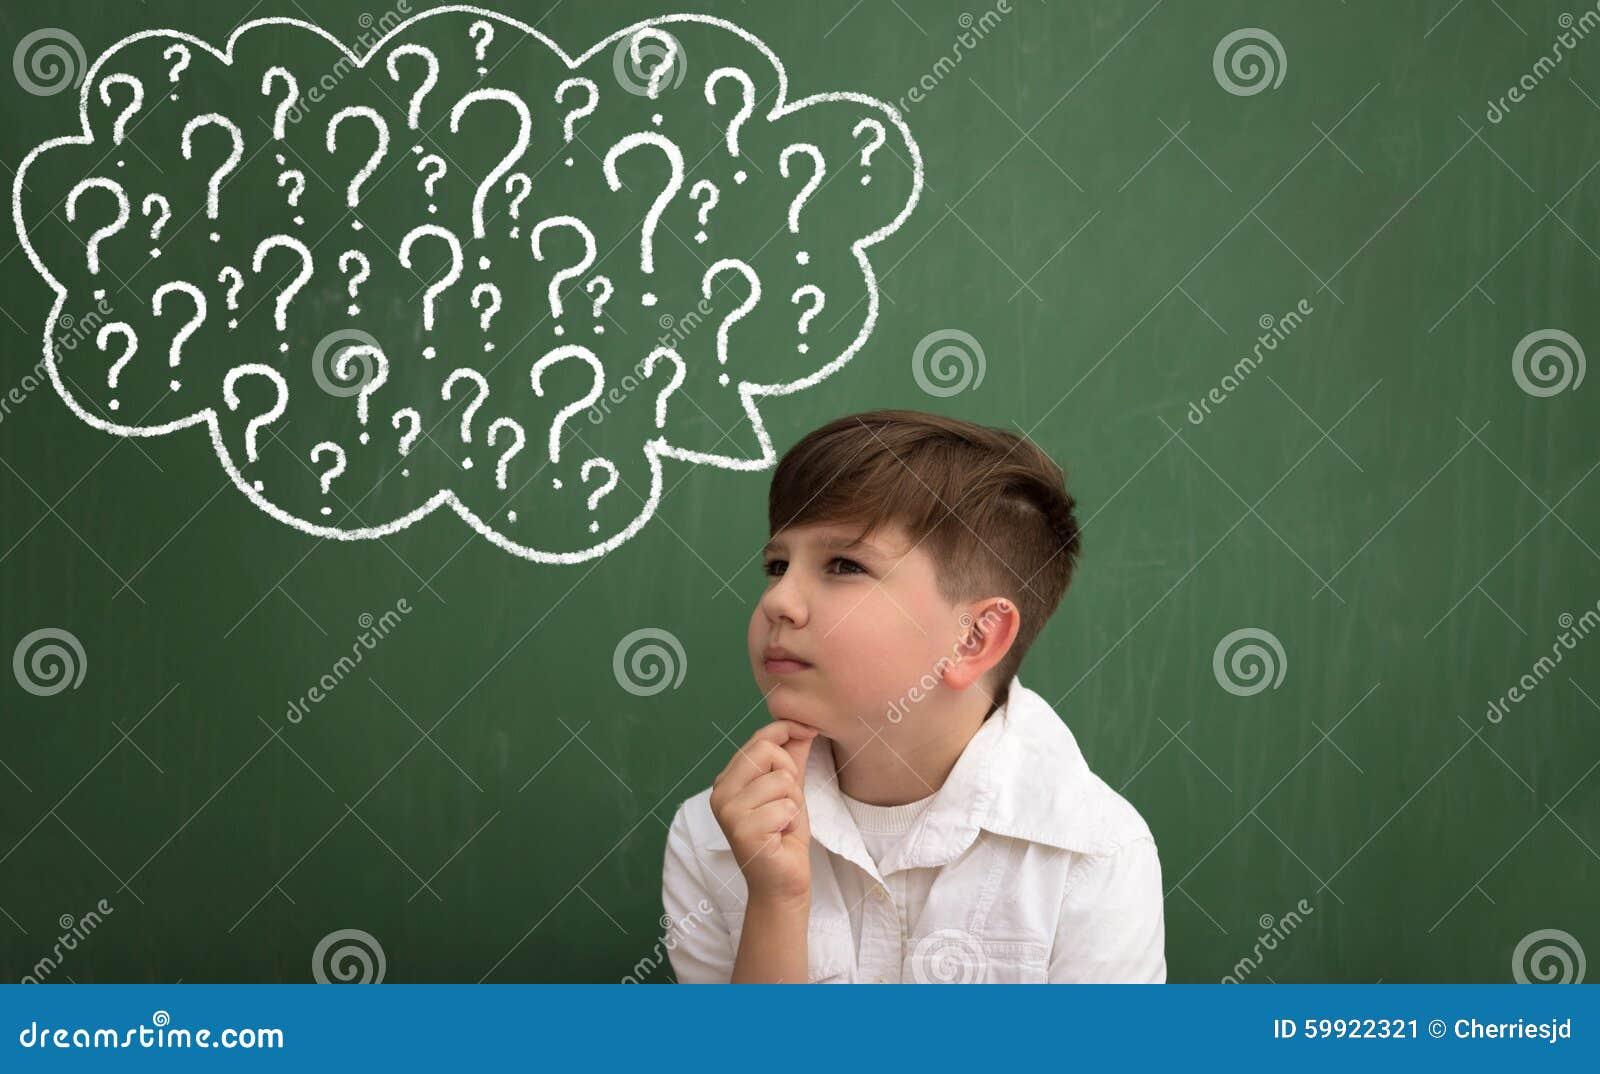 Kid think bubble